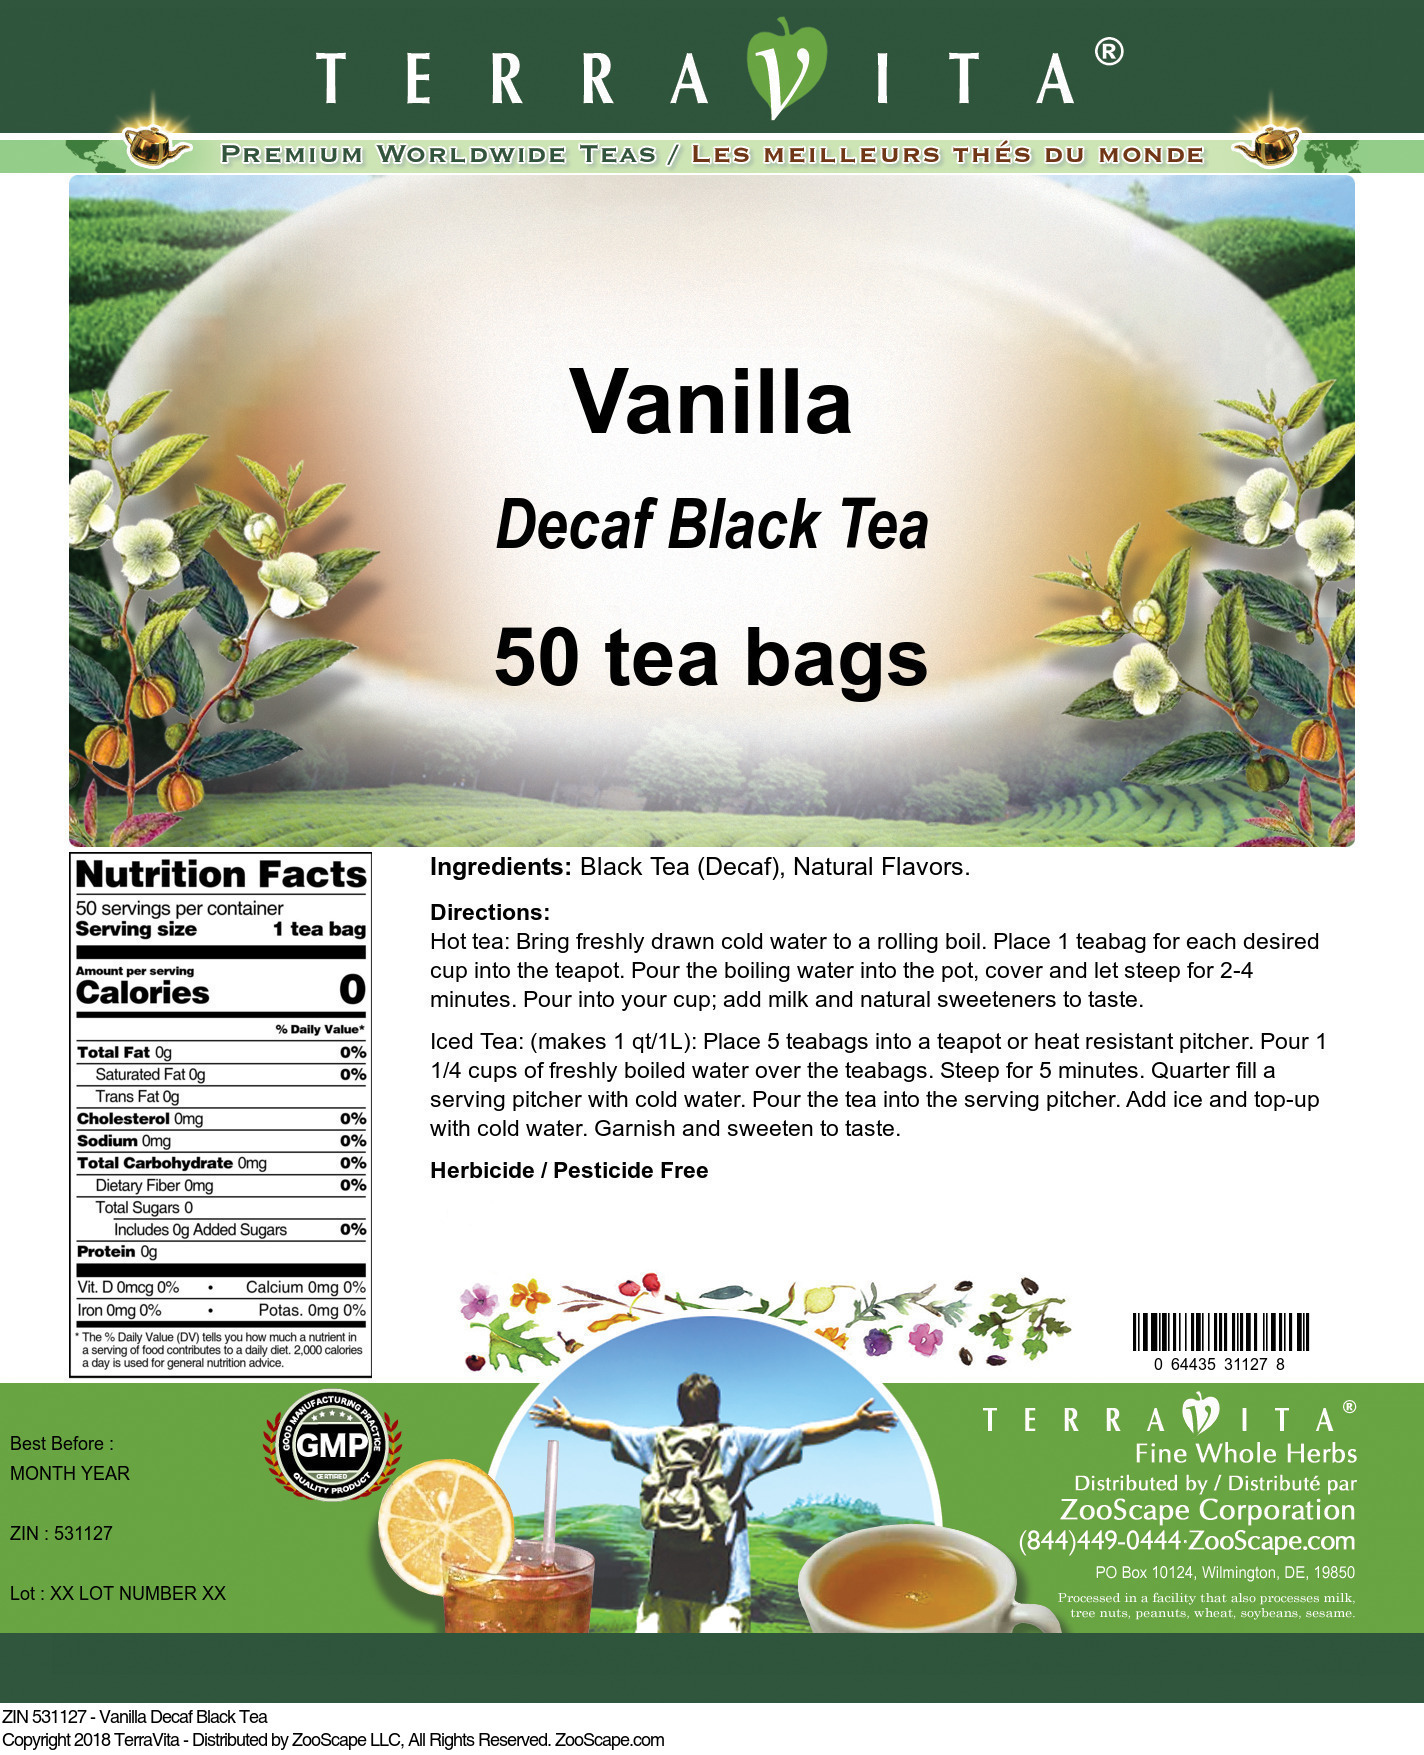 Vanilla Decaf Black Tea